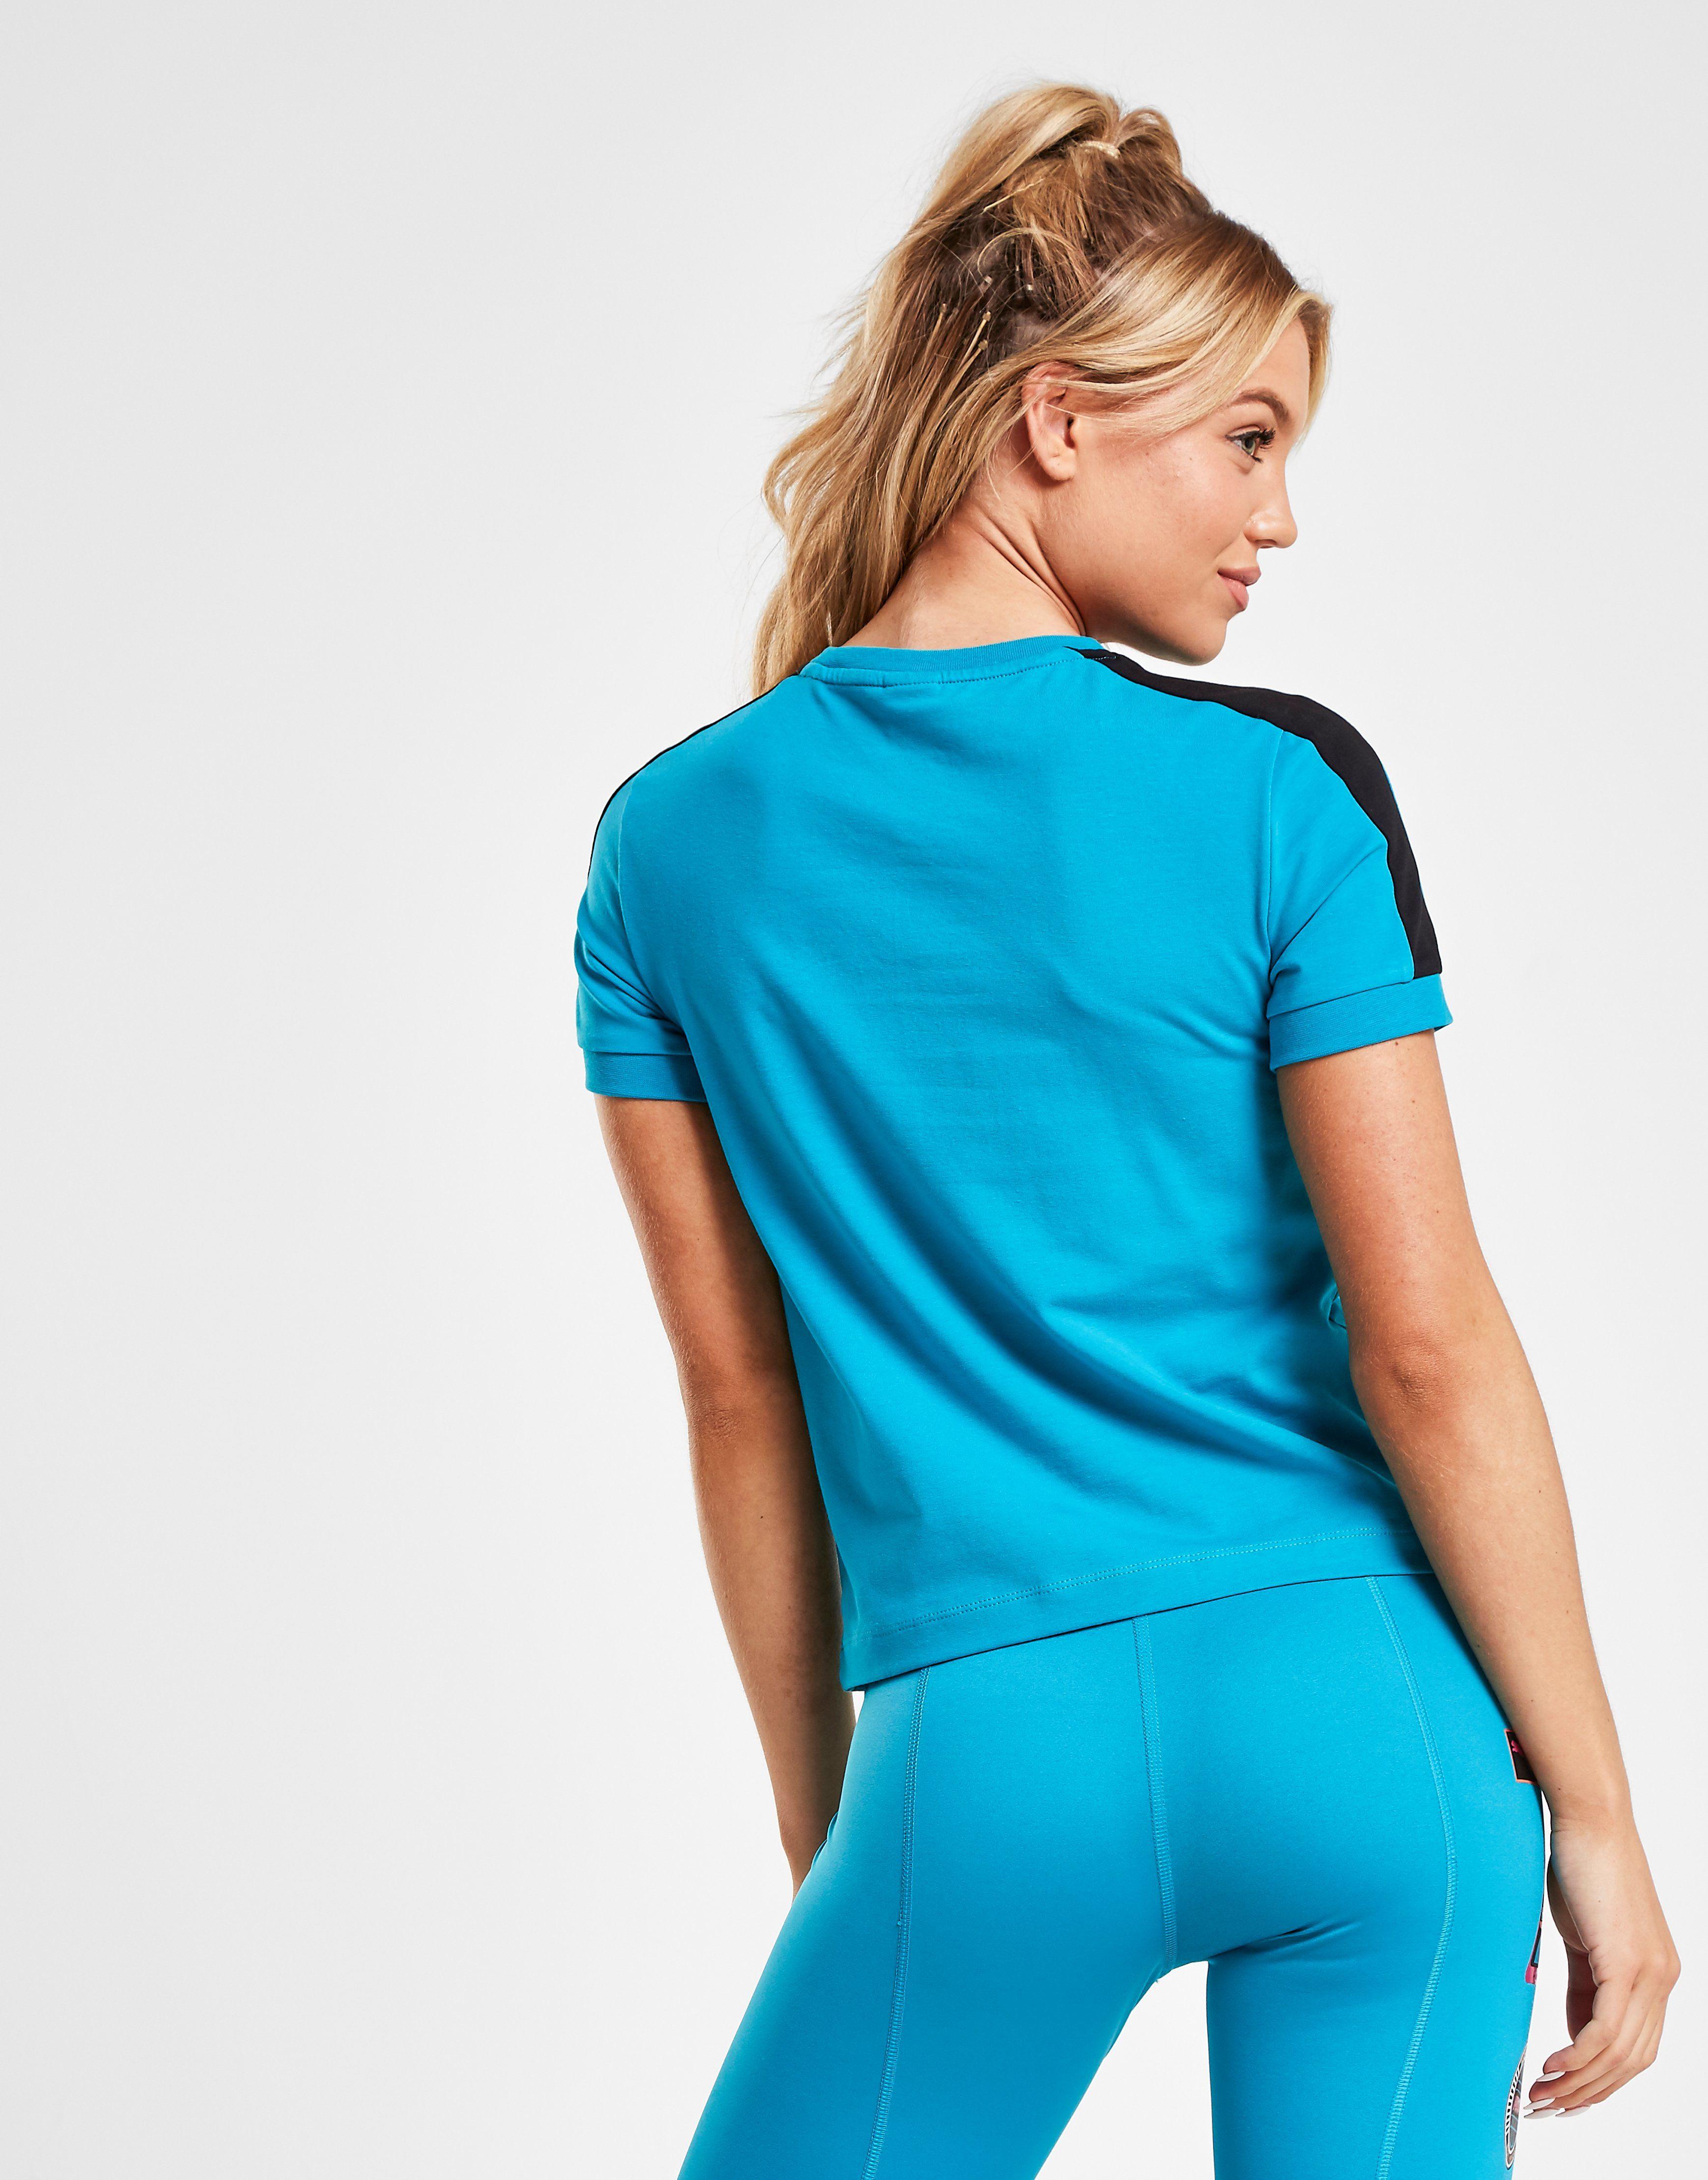 PUMA Classics T7 T-Shirt